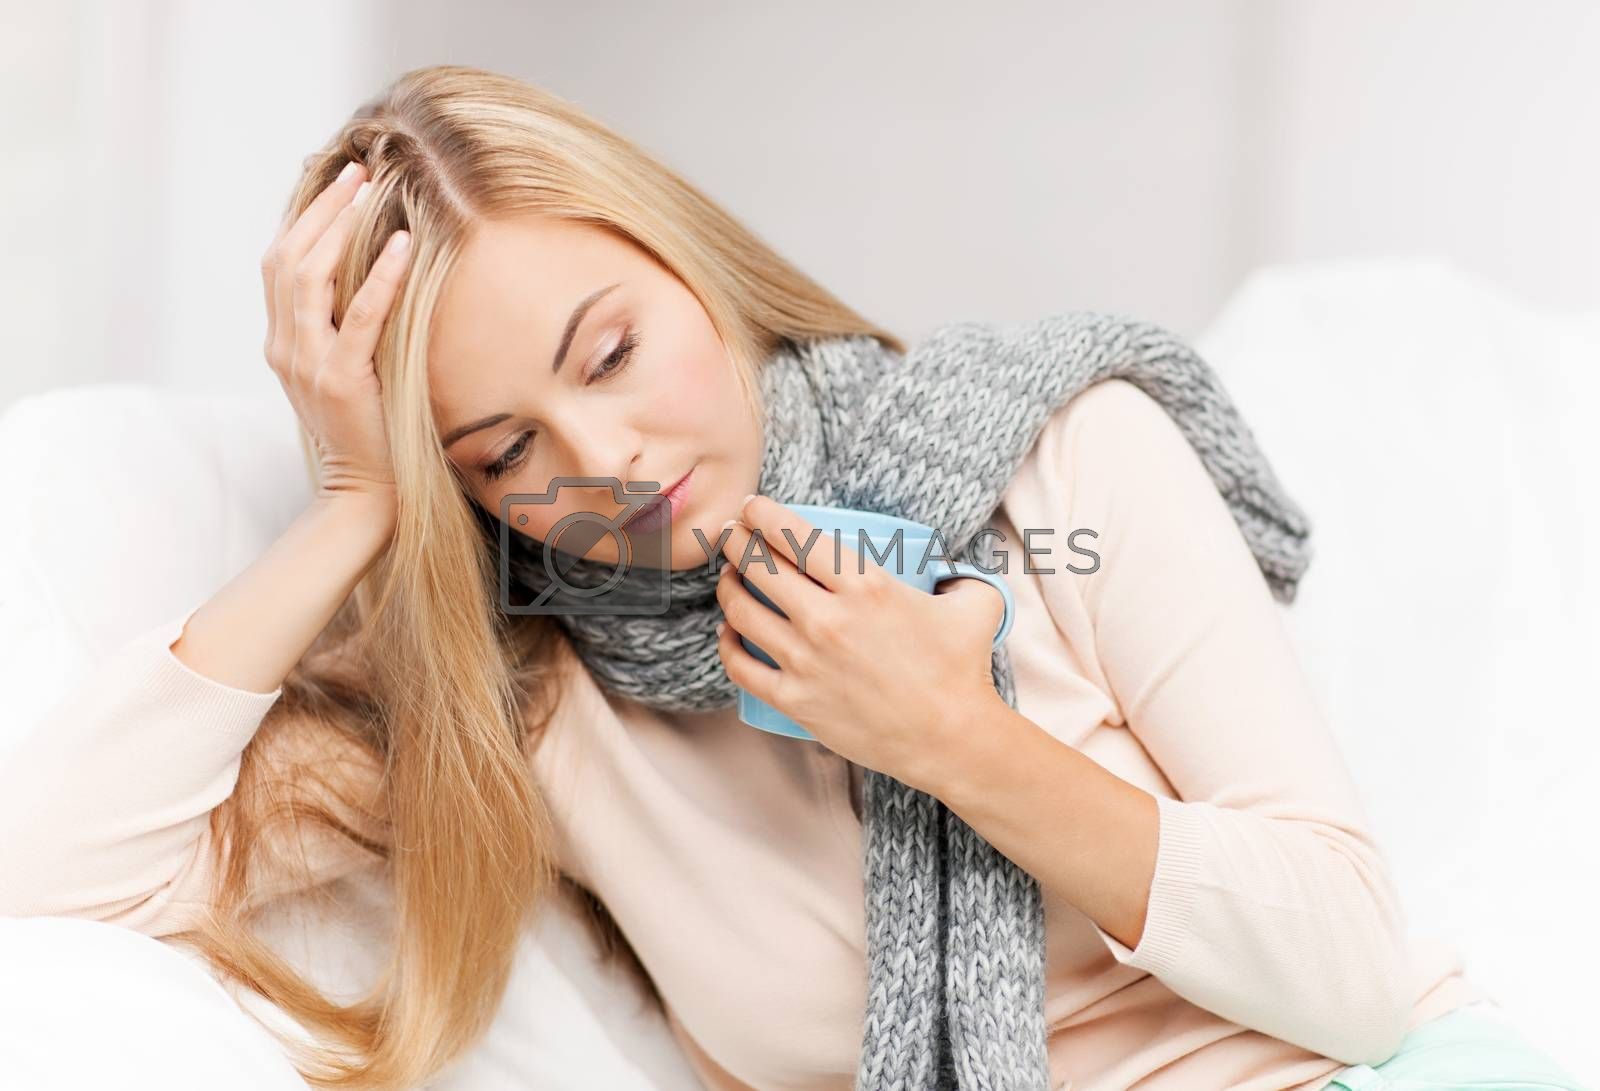 diseased woman with cup of tea by dolgachov